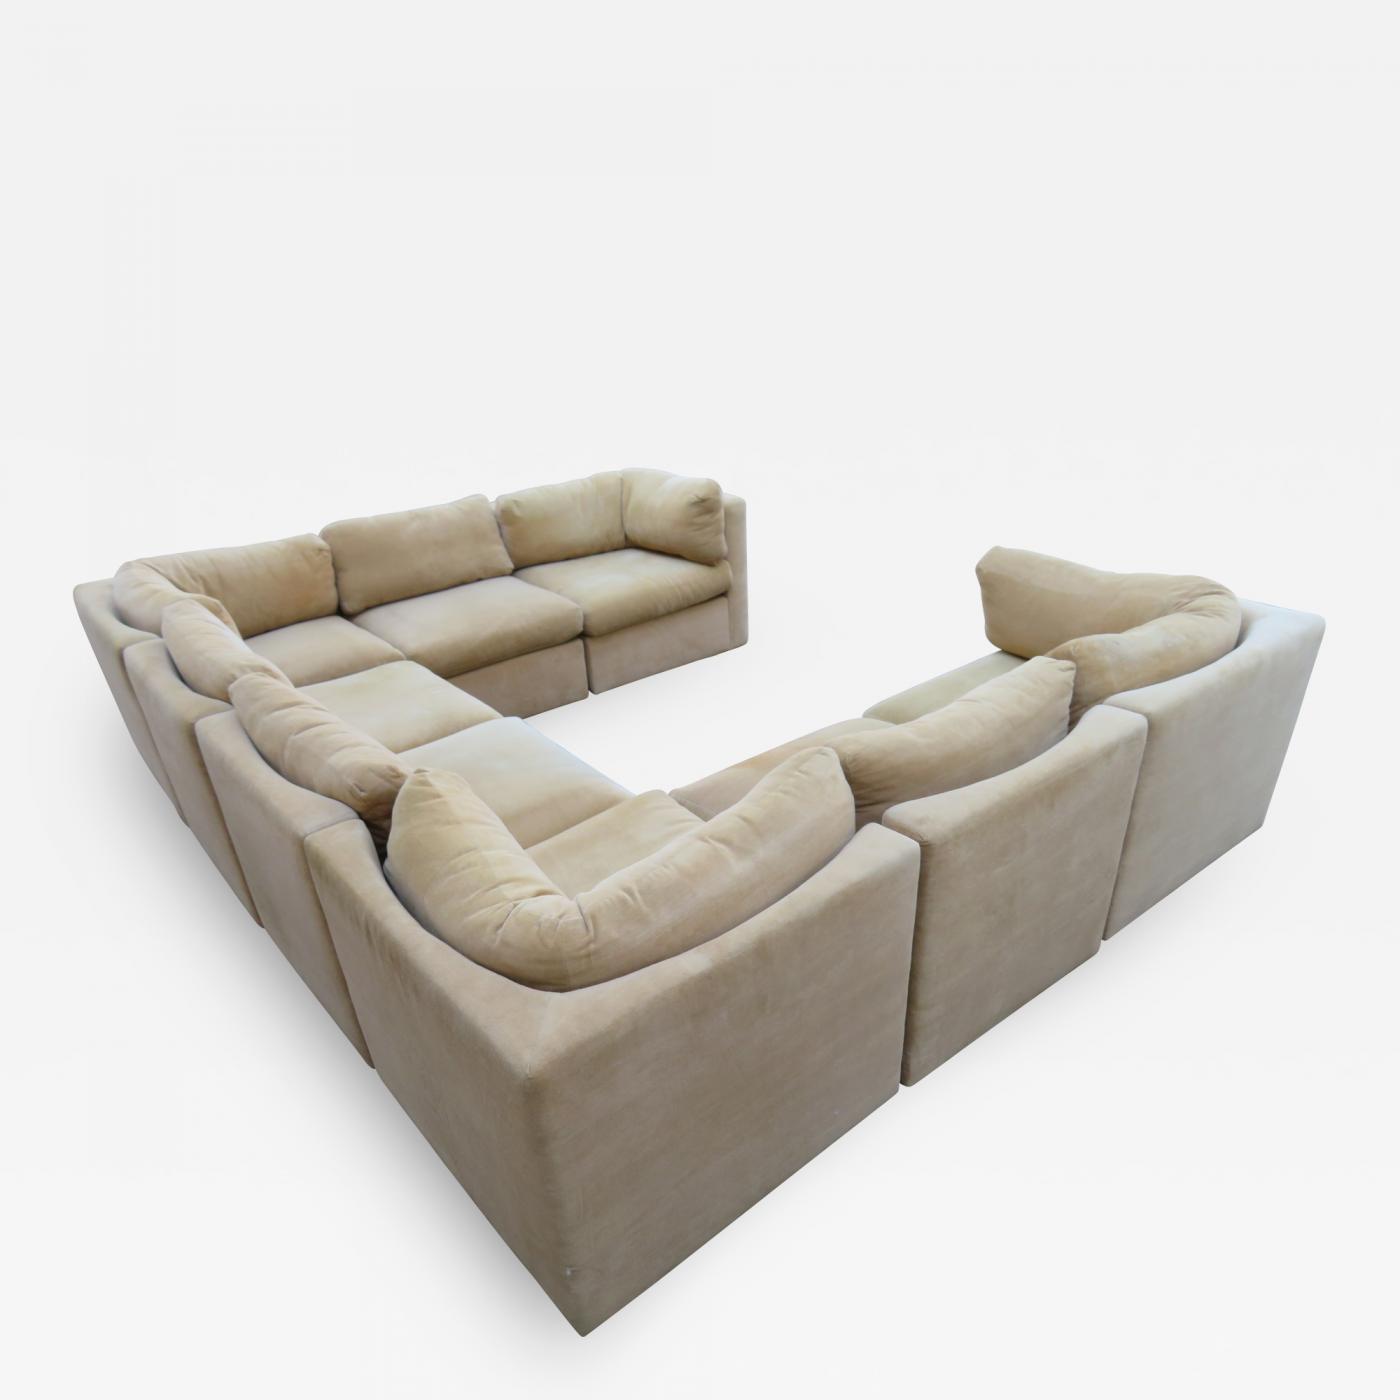 Milo Baughman - Wonderful 8 Piece Milo Baughman Curved Seat Sectional Sofa  Mid-Century Modern